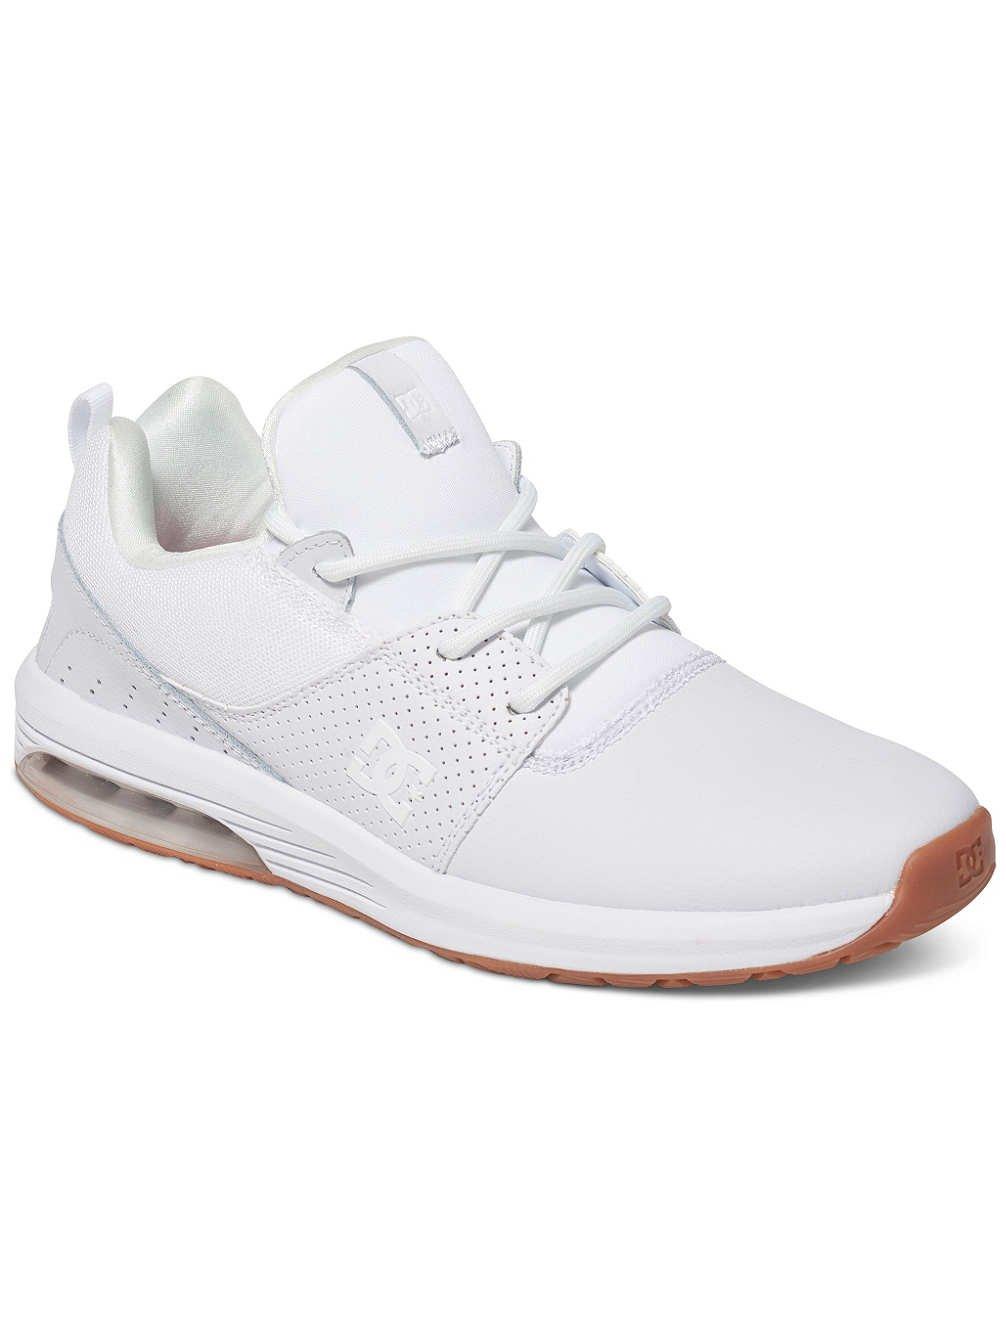 DC Shoes Heathrow IA - Zapatillas para Hombre 43 EU|White/White/Gum